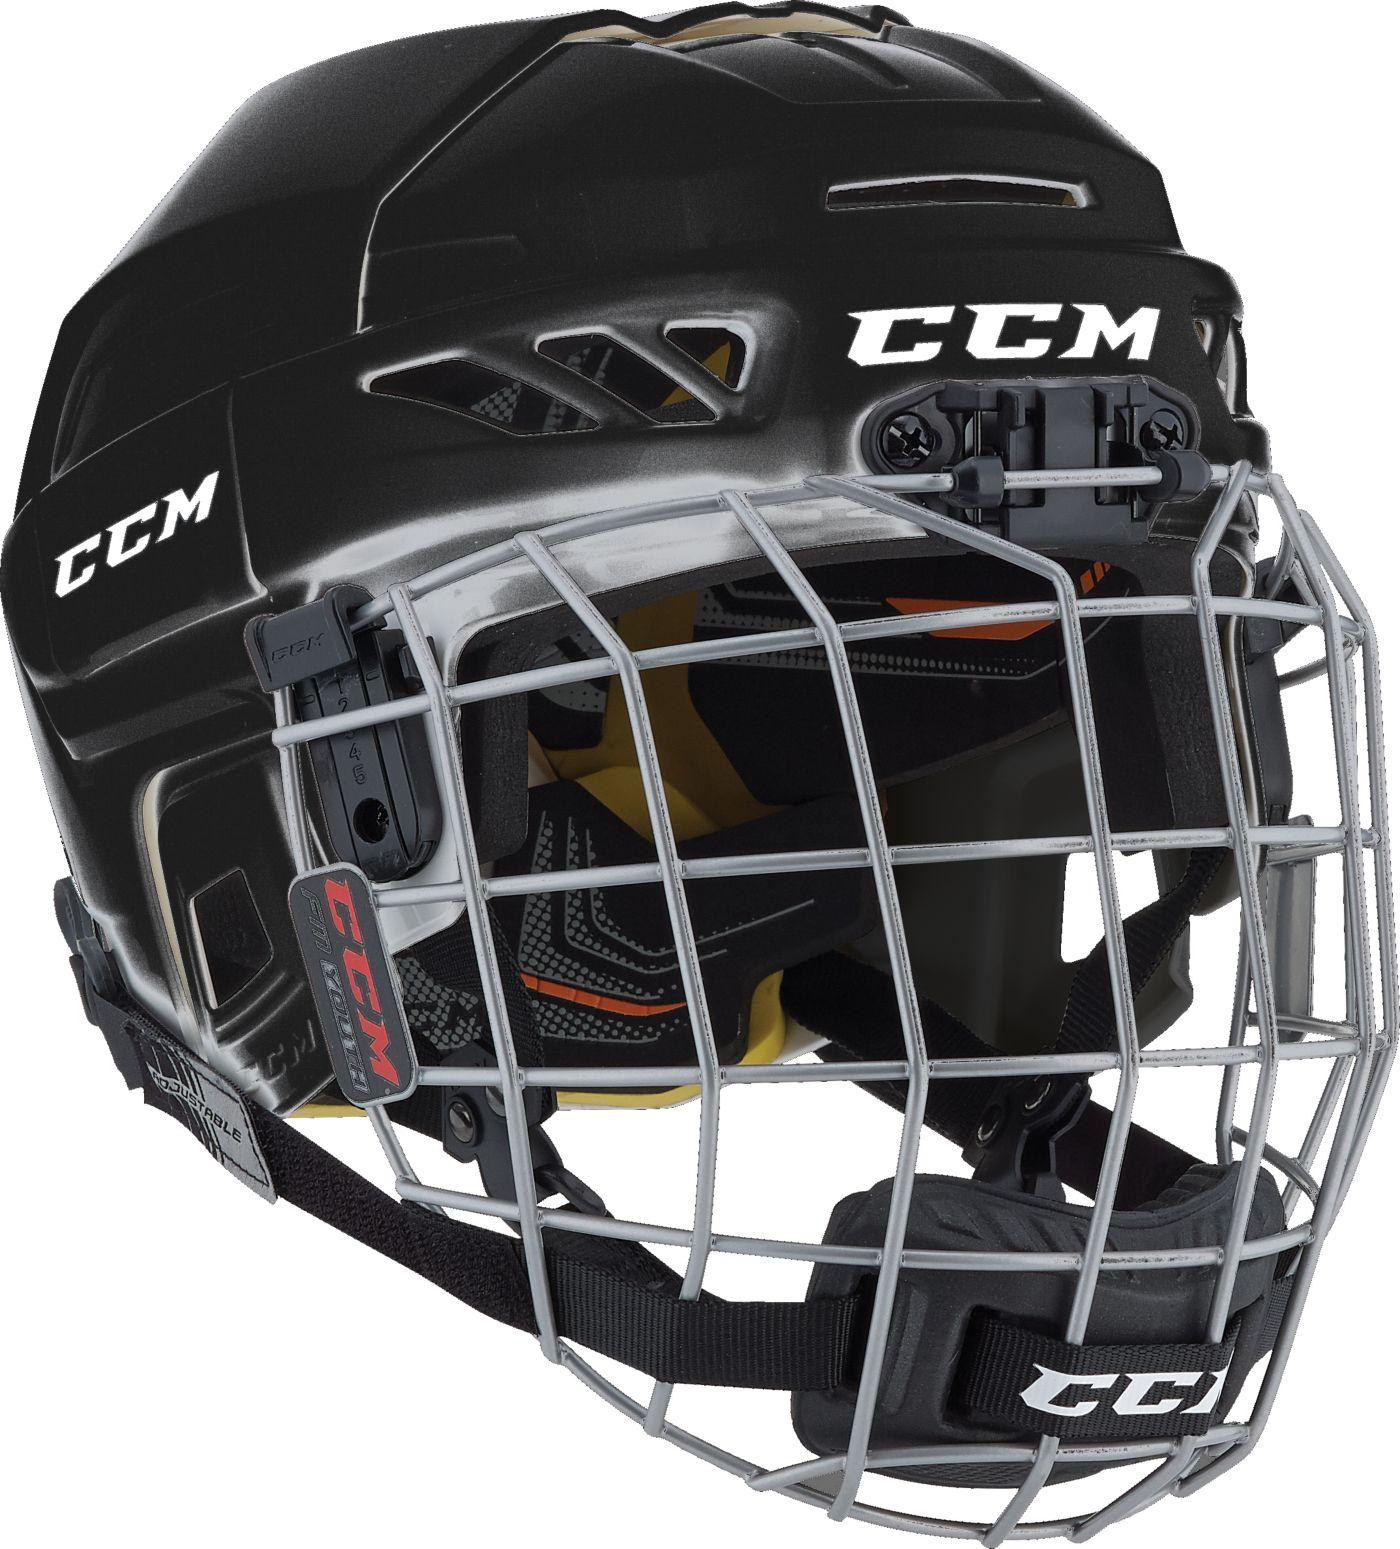 CCM Youth FL3DS Fitlite Ice Hockey Helmet Combo